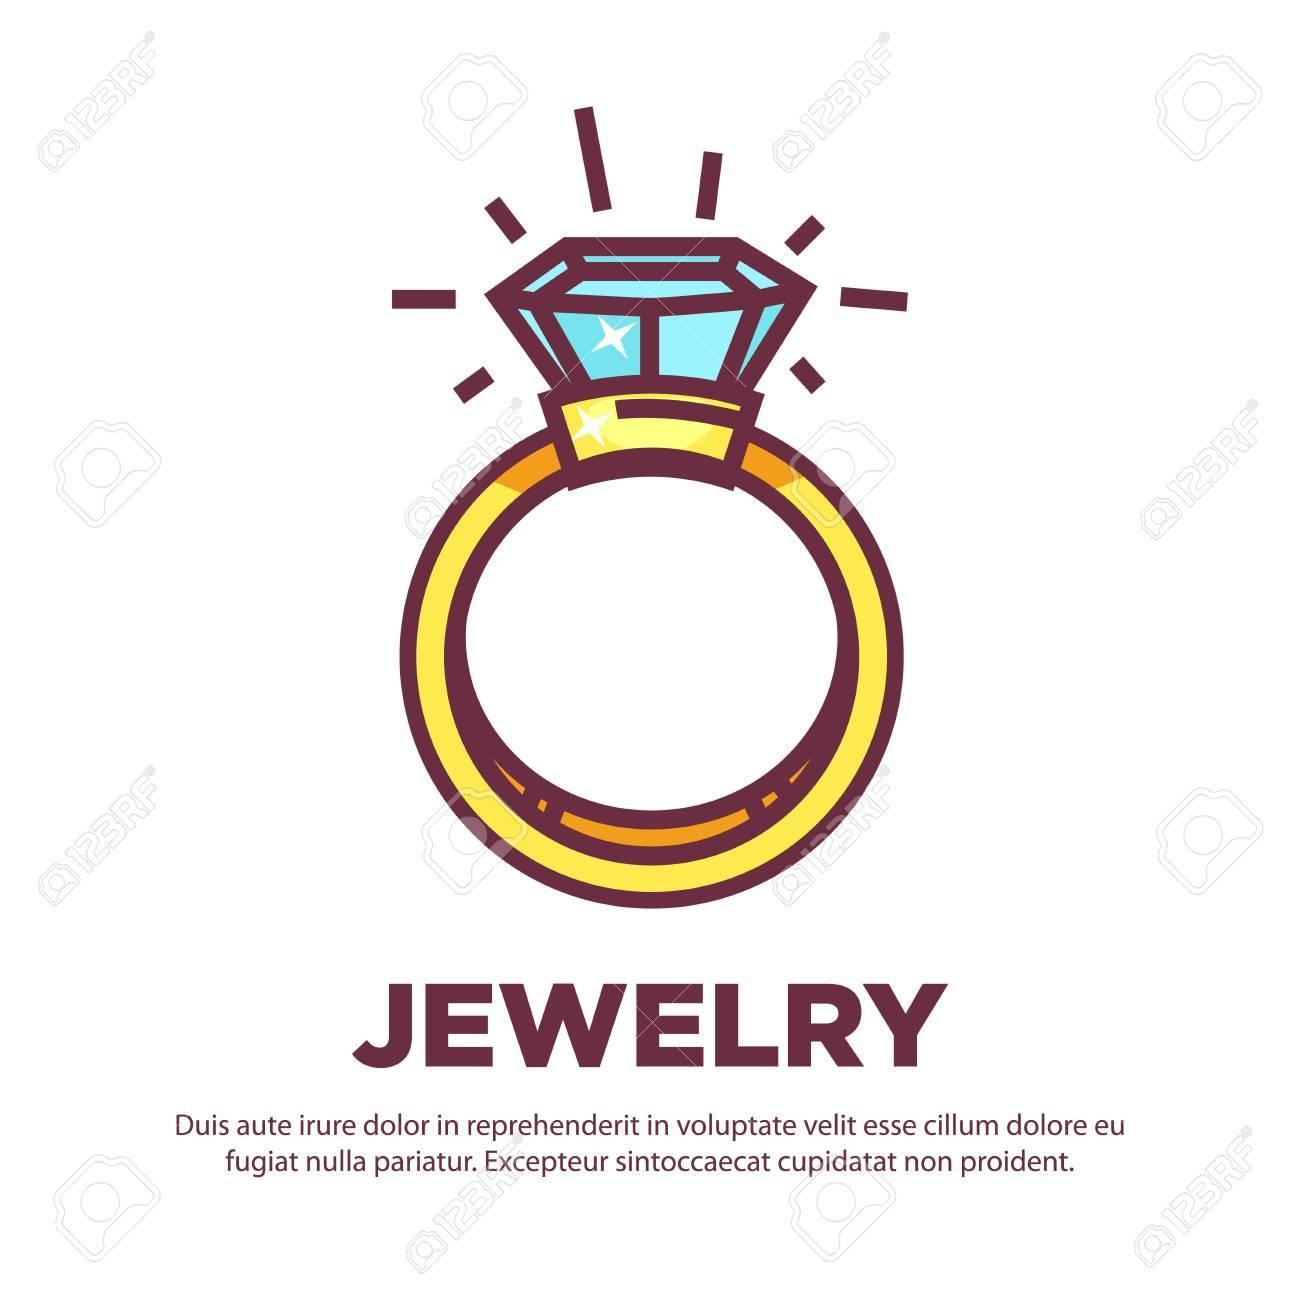 jewelry golden diamond wedding ring vector flat icon design royalty